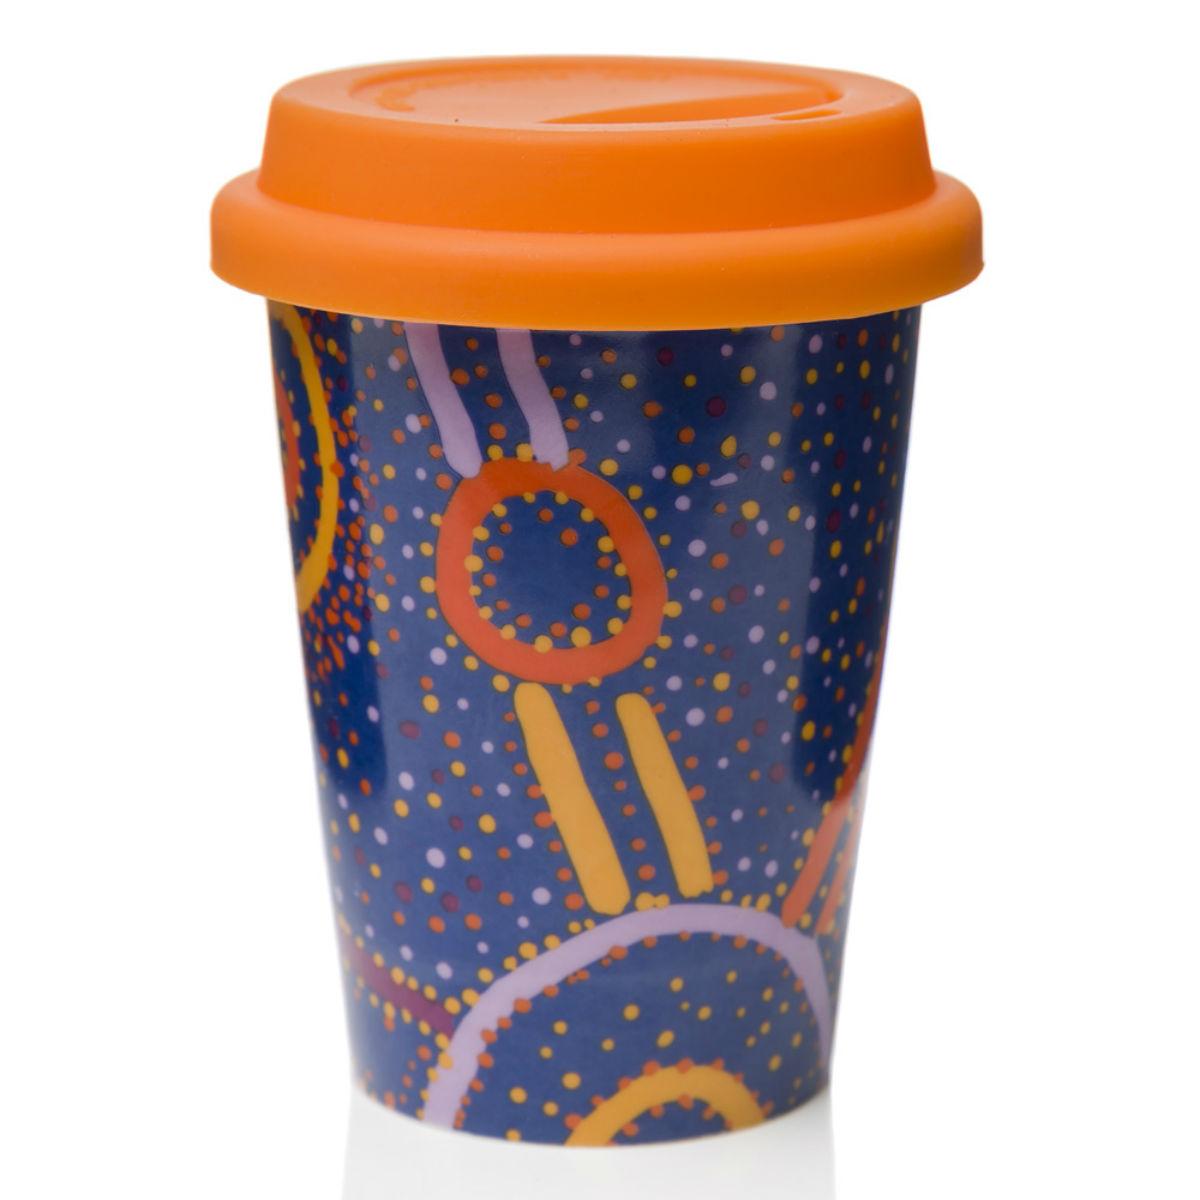 Alperstein Designs -- Australia: Watson Robertson Insulated Mug